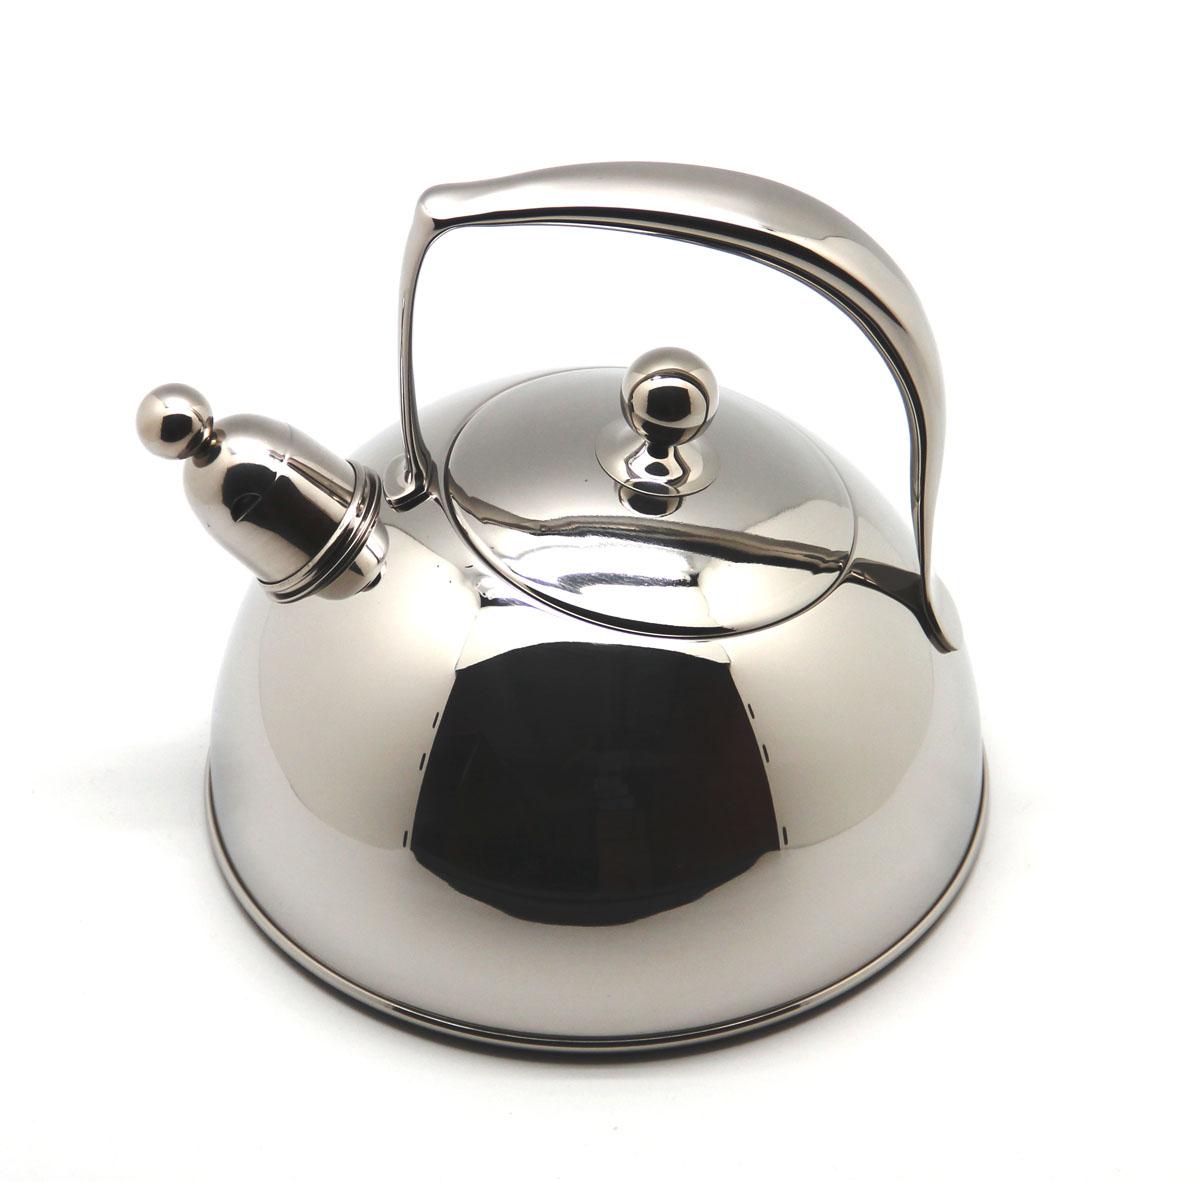 Чайник Silampos Жасмин, со свистком, 2 л. 411307302620